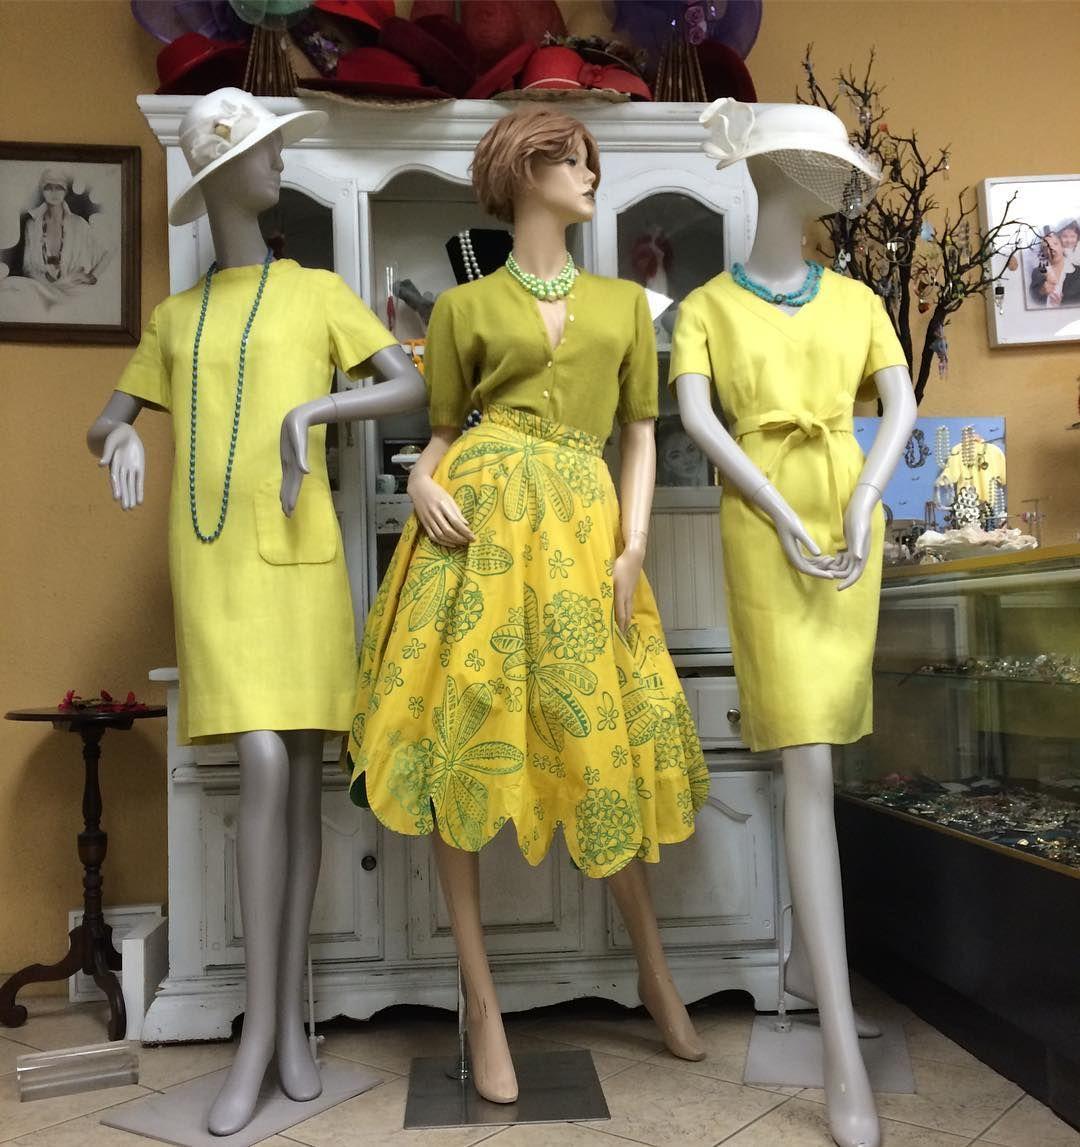 "40 Likes, 1 Comments - Adira's Vintage Boutique (@adirasboutique) on Instagram: ""50's and 60's Dresses!!! 60's Dresses!!!! Wardrobe-styling : Adira's Vintage Boutique  #lalaland…"""